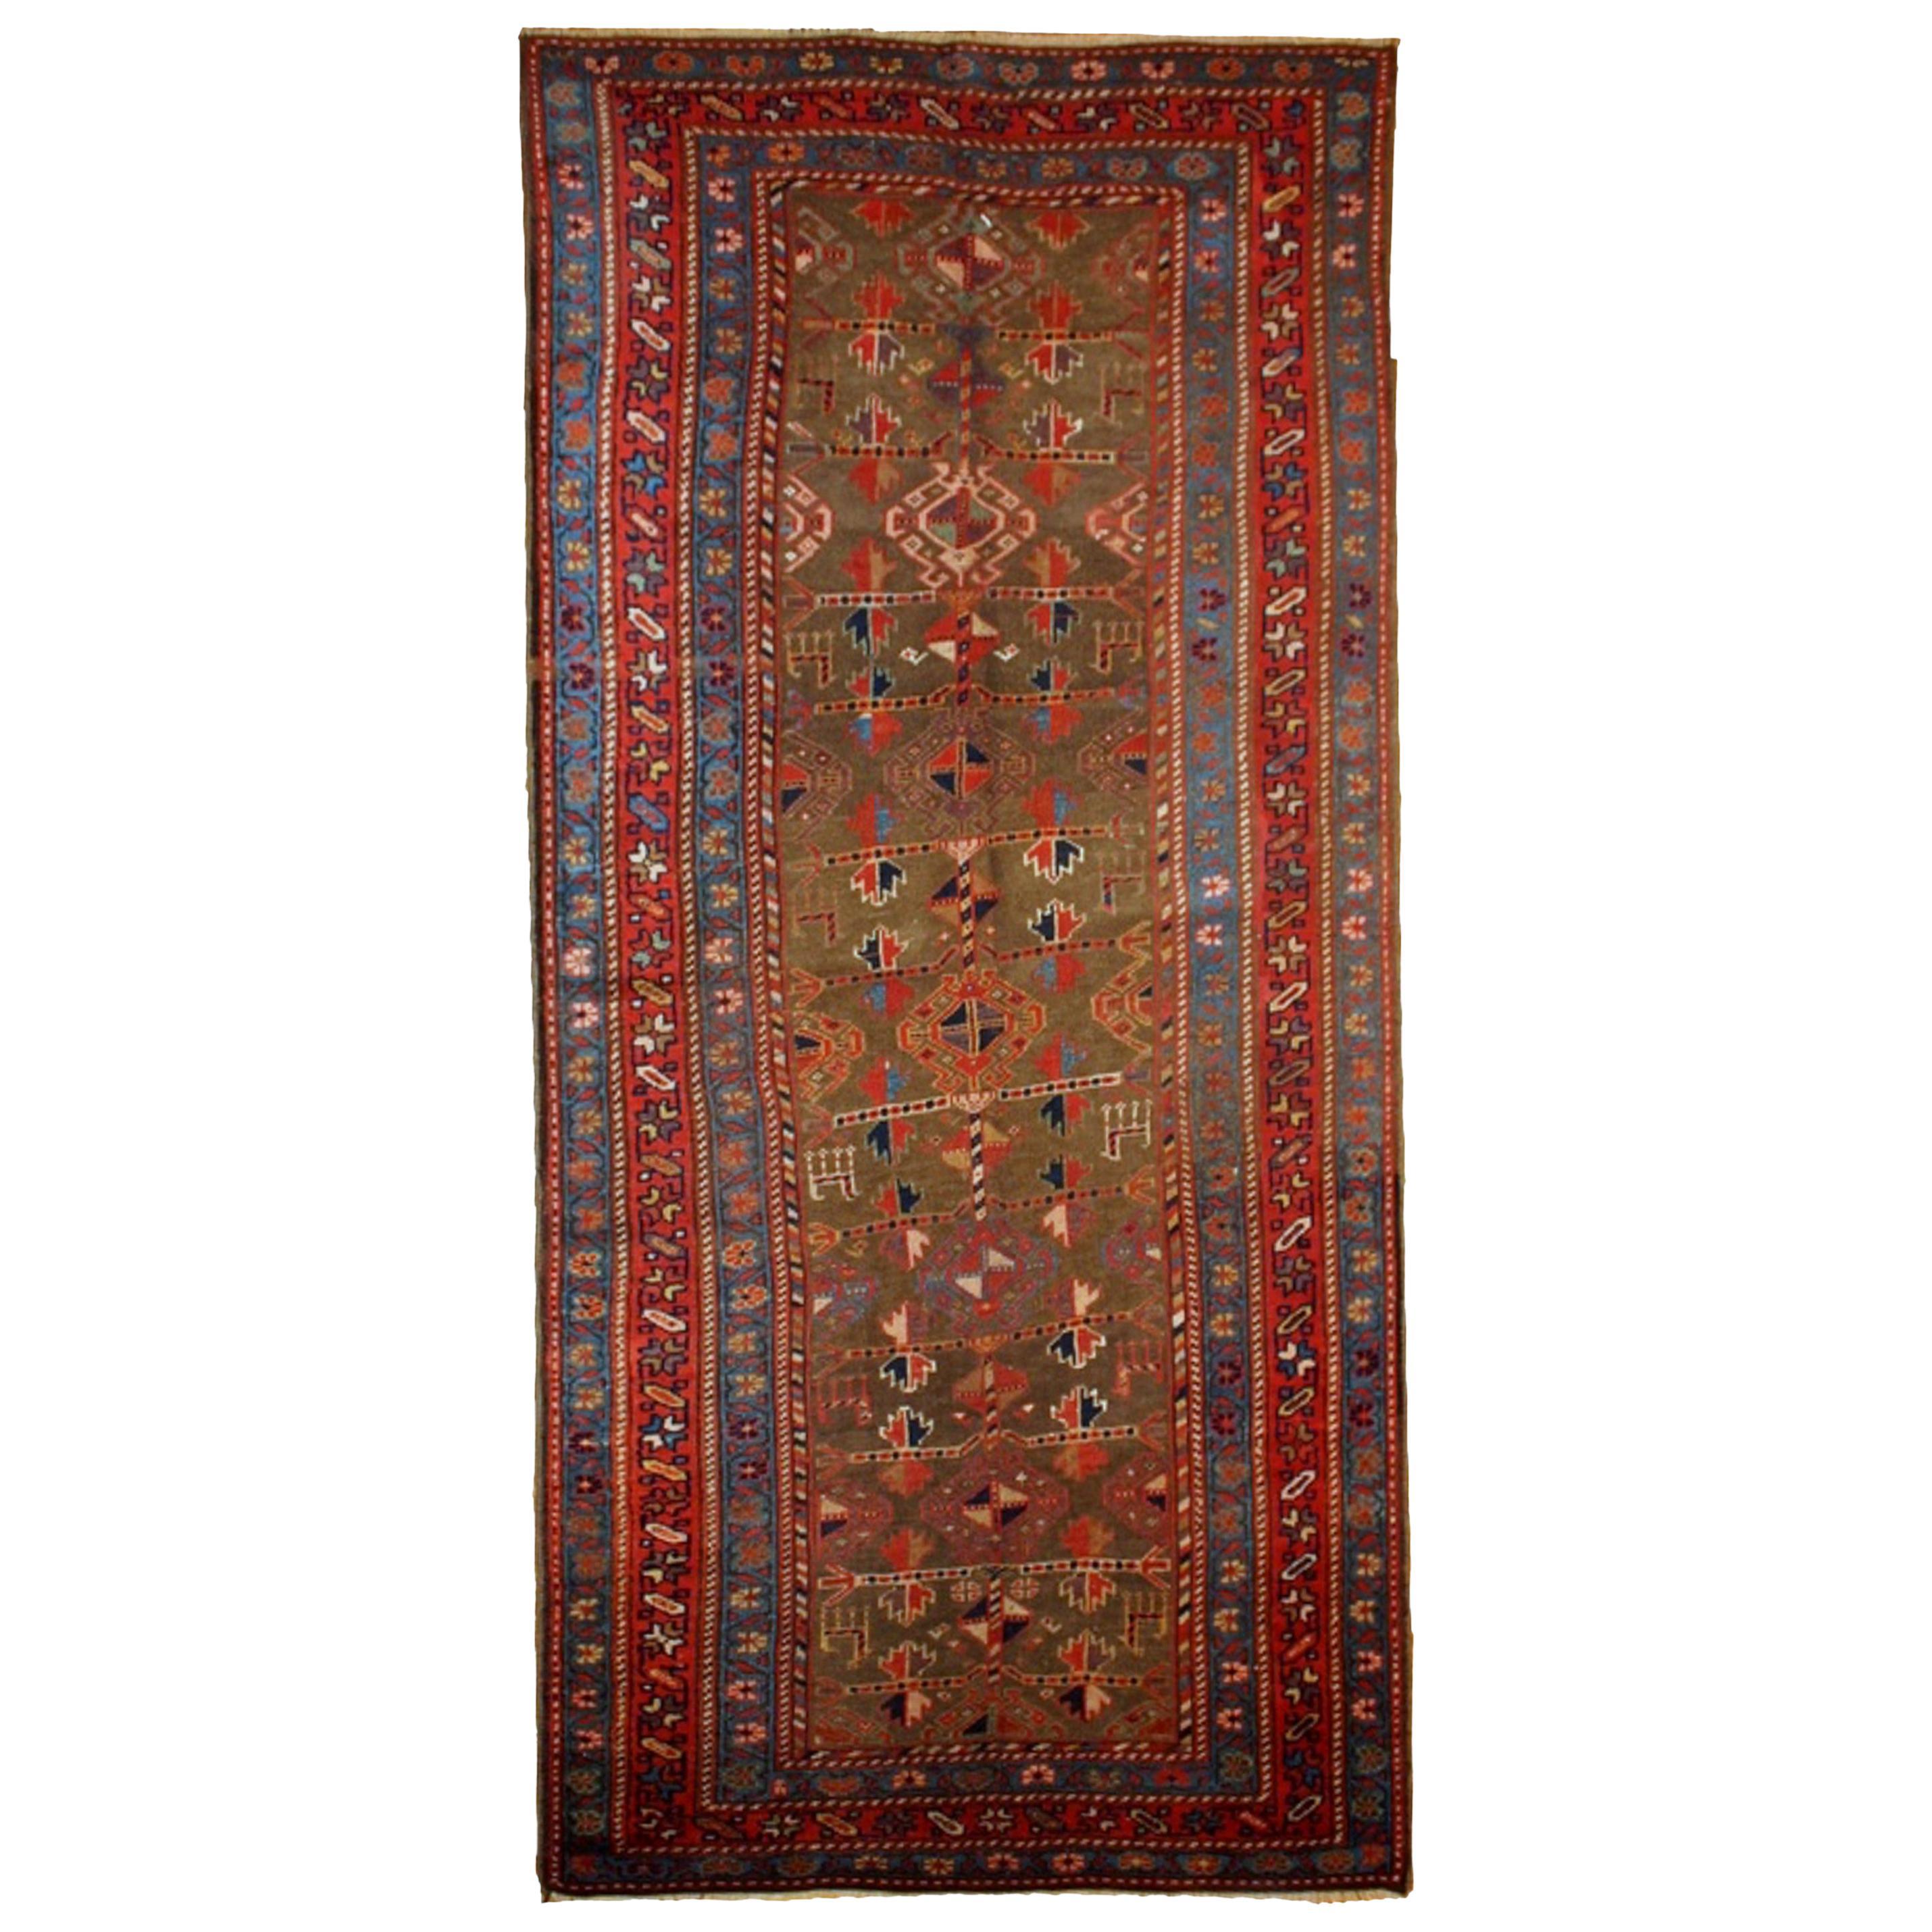 Handmade Antique Kurdish Style Rug, 1880s, 1B415